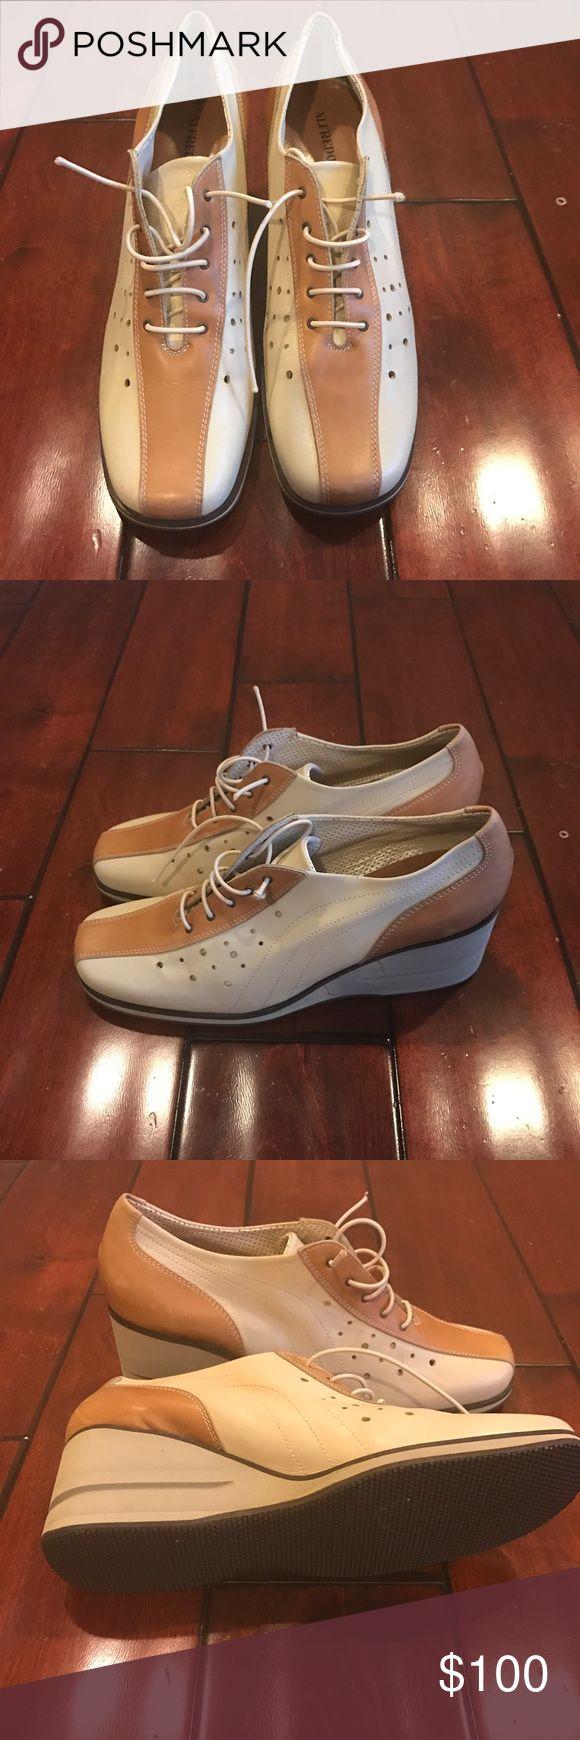 Alfredo Giantin Italian Oxford Wedge Shoes sz 10 Italian designer hand made. Like New. Size 10 alfredo Giantin Shoes Wedges